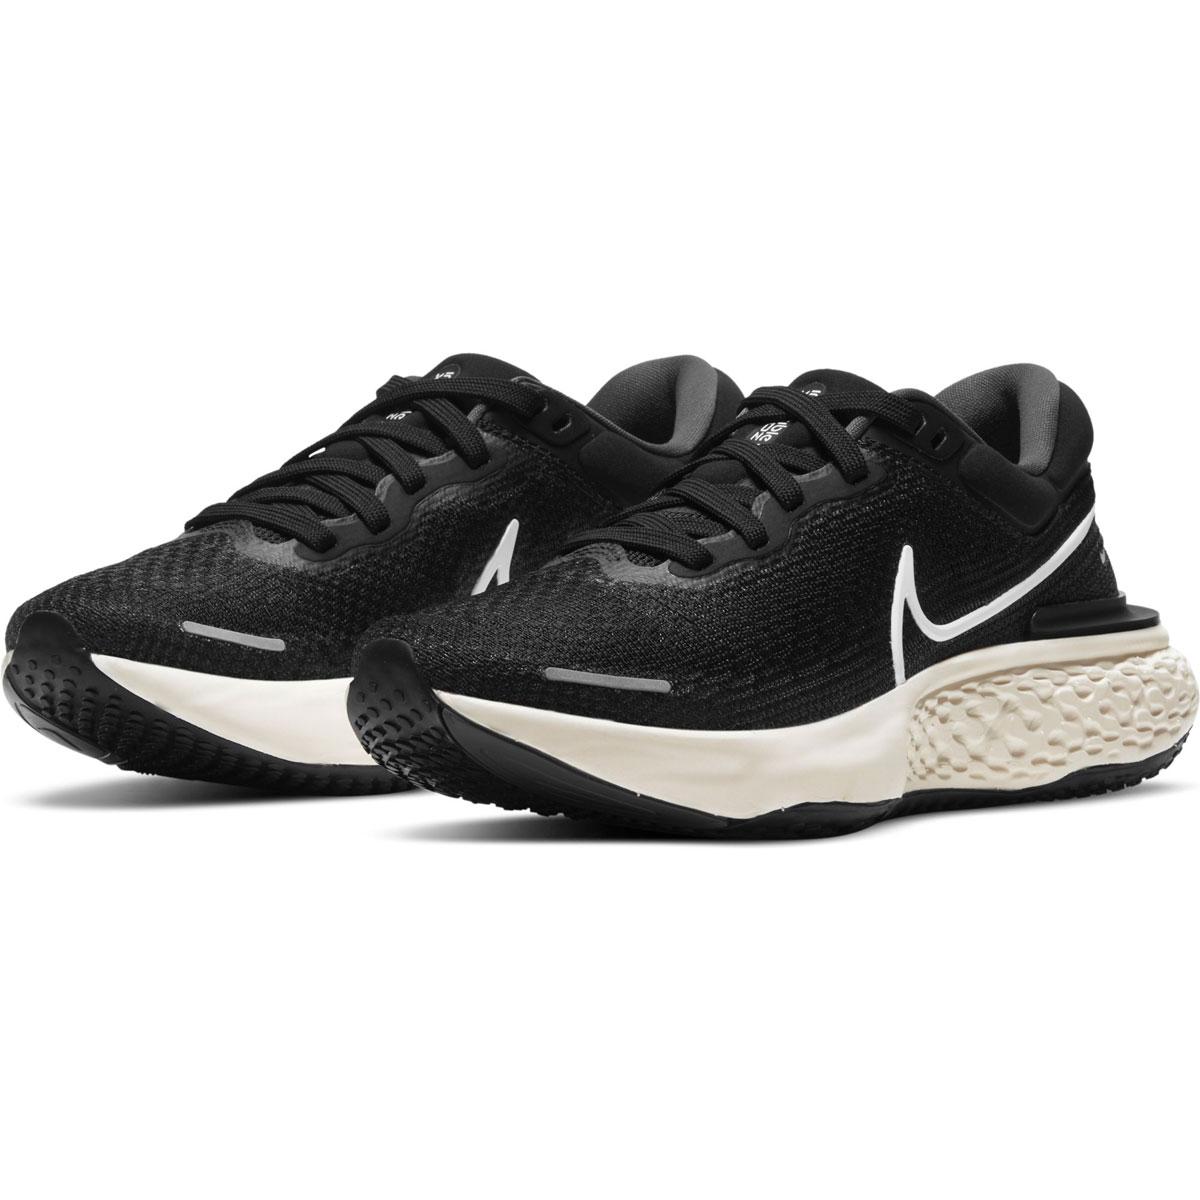 Women's Nike Zoomx Invincible Run FlyKnit Running Shoe - Color: Black/White/Iron Grey - Size: 5 - Width: Regular, Black/White/Iron Grey, large, image 5